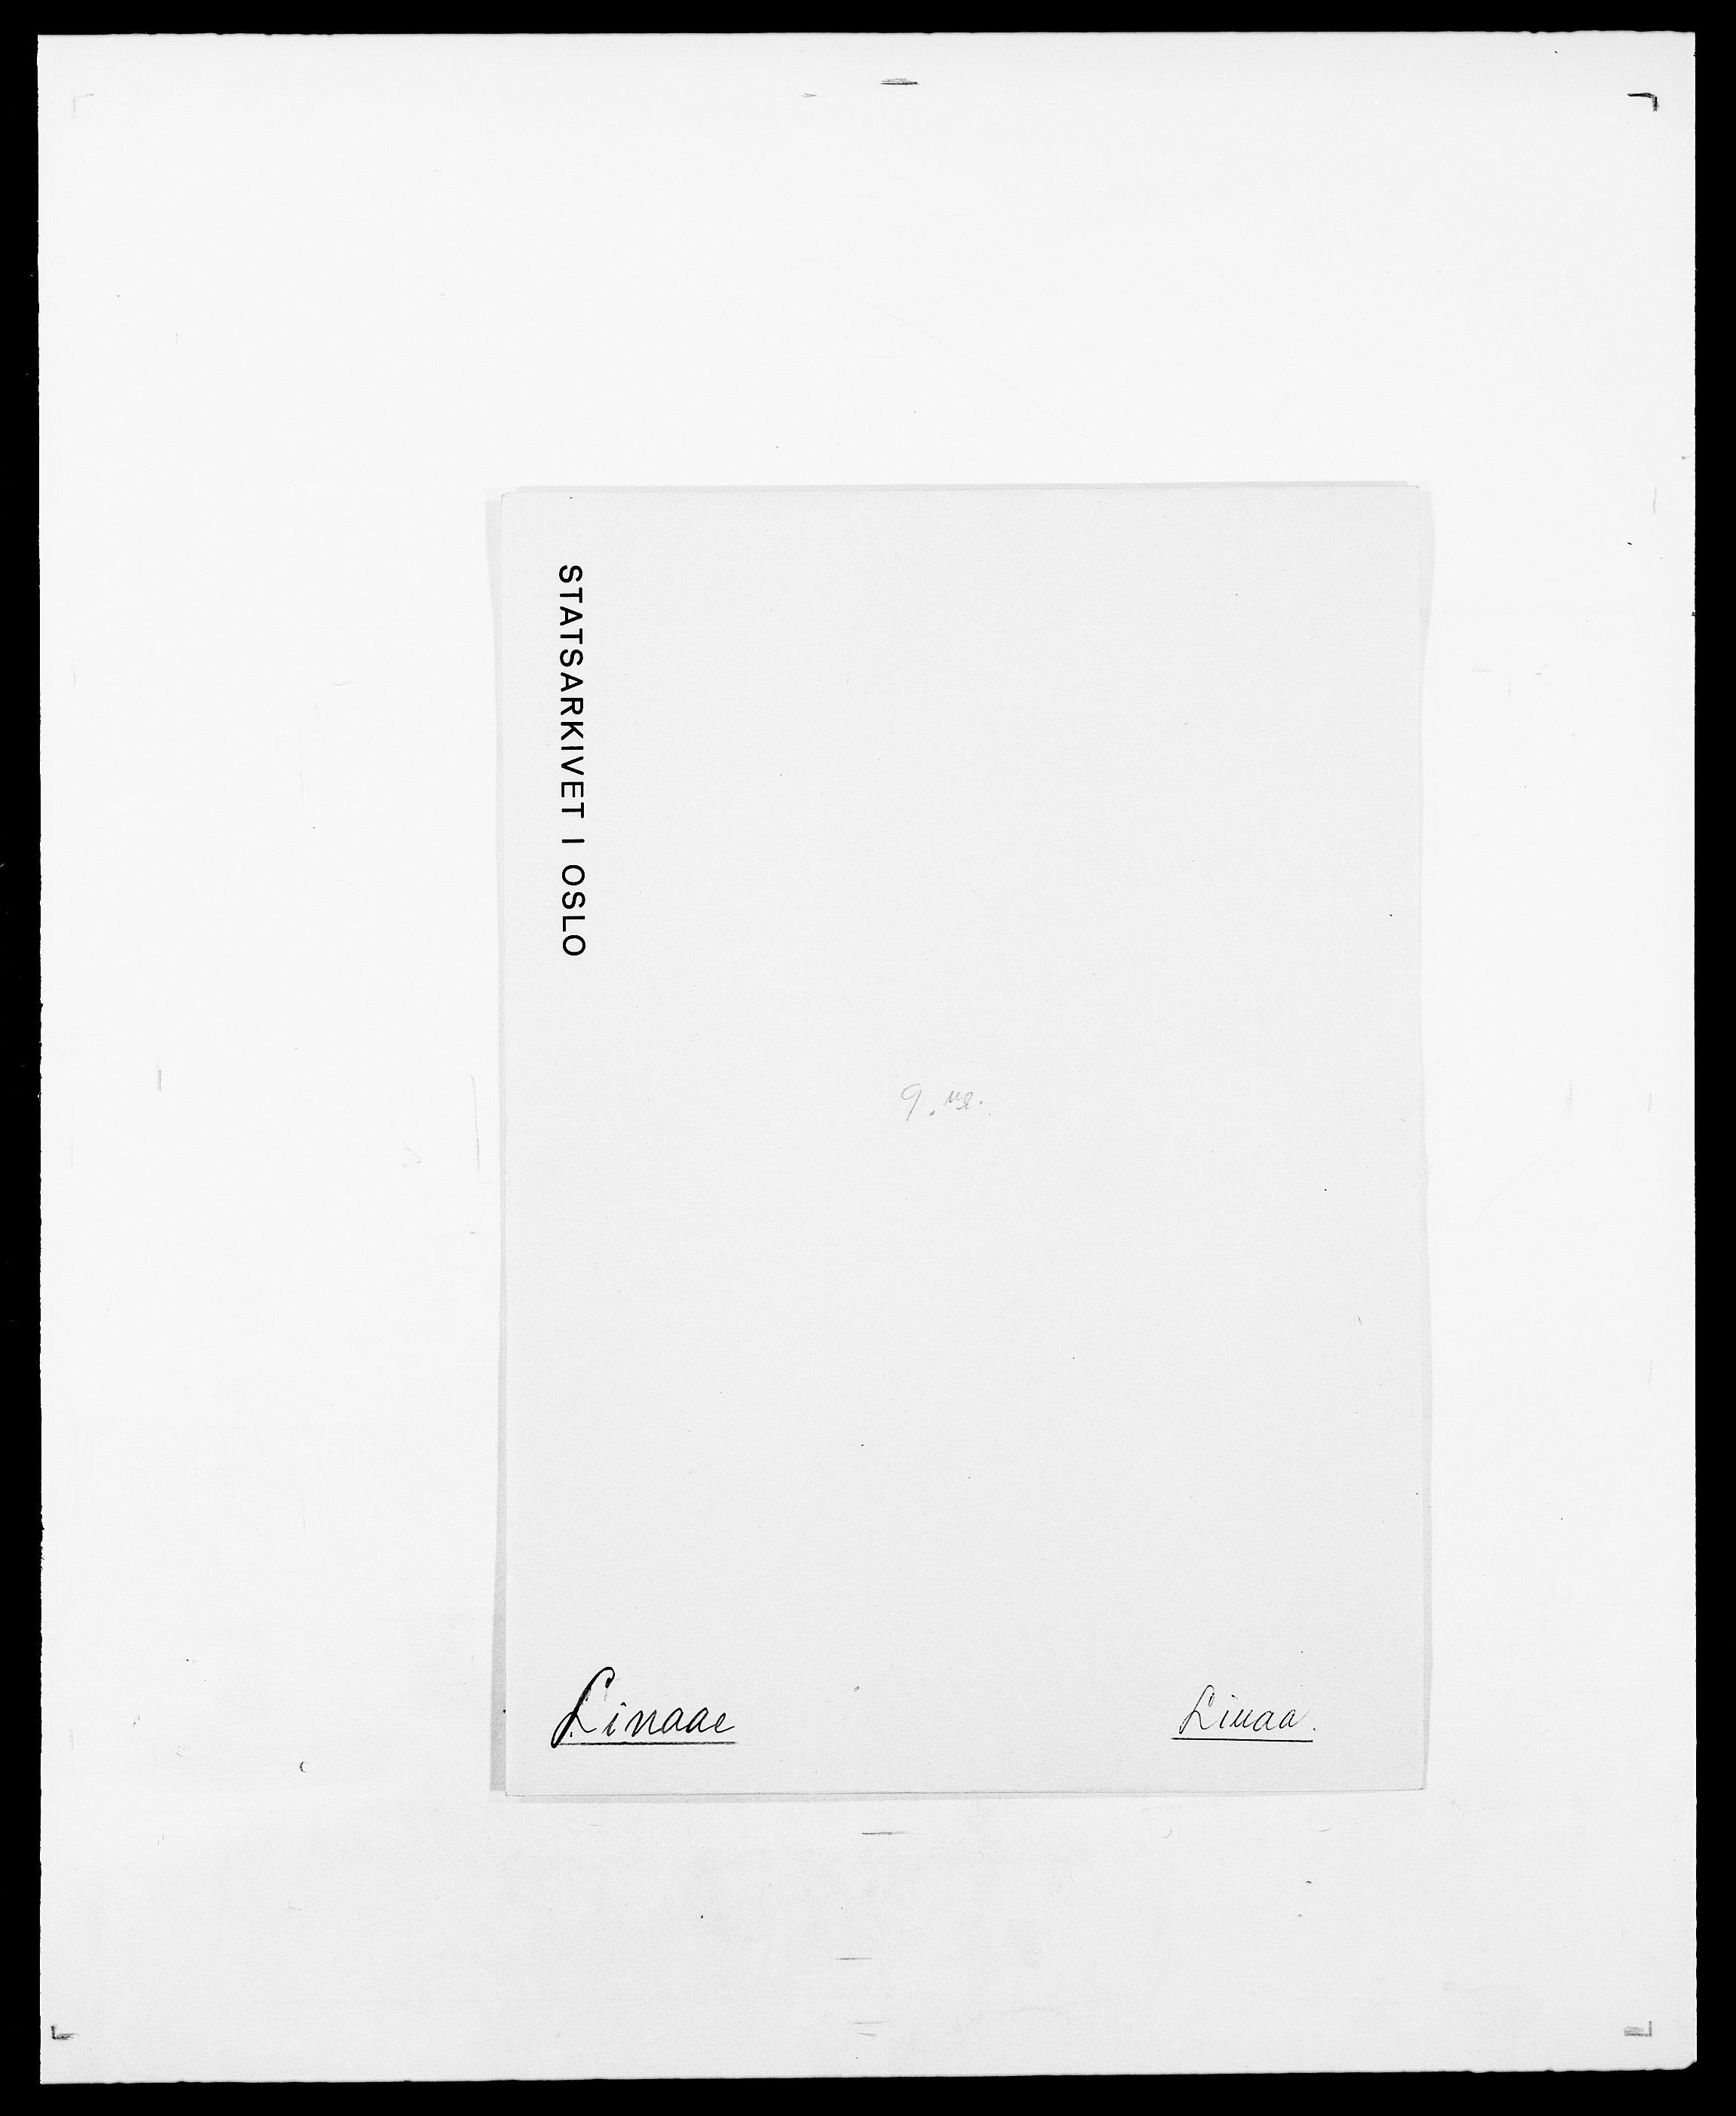 SAO, Delgobe, Charles Antoine - samling, D/Da/L0023: Lau - Lirvyn, s. 644